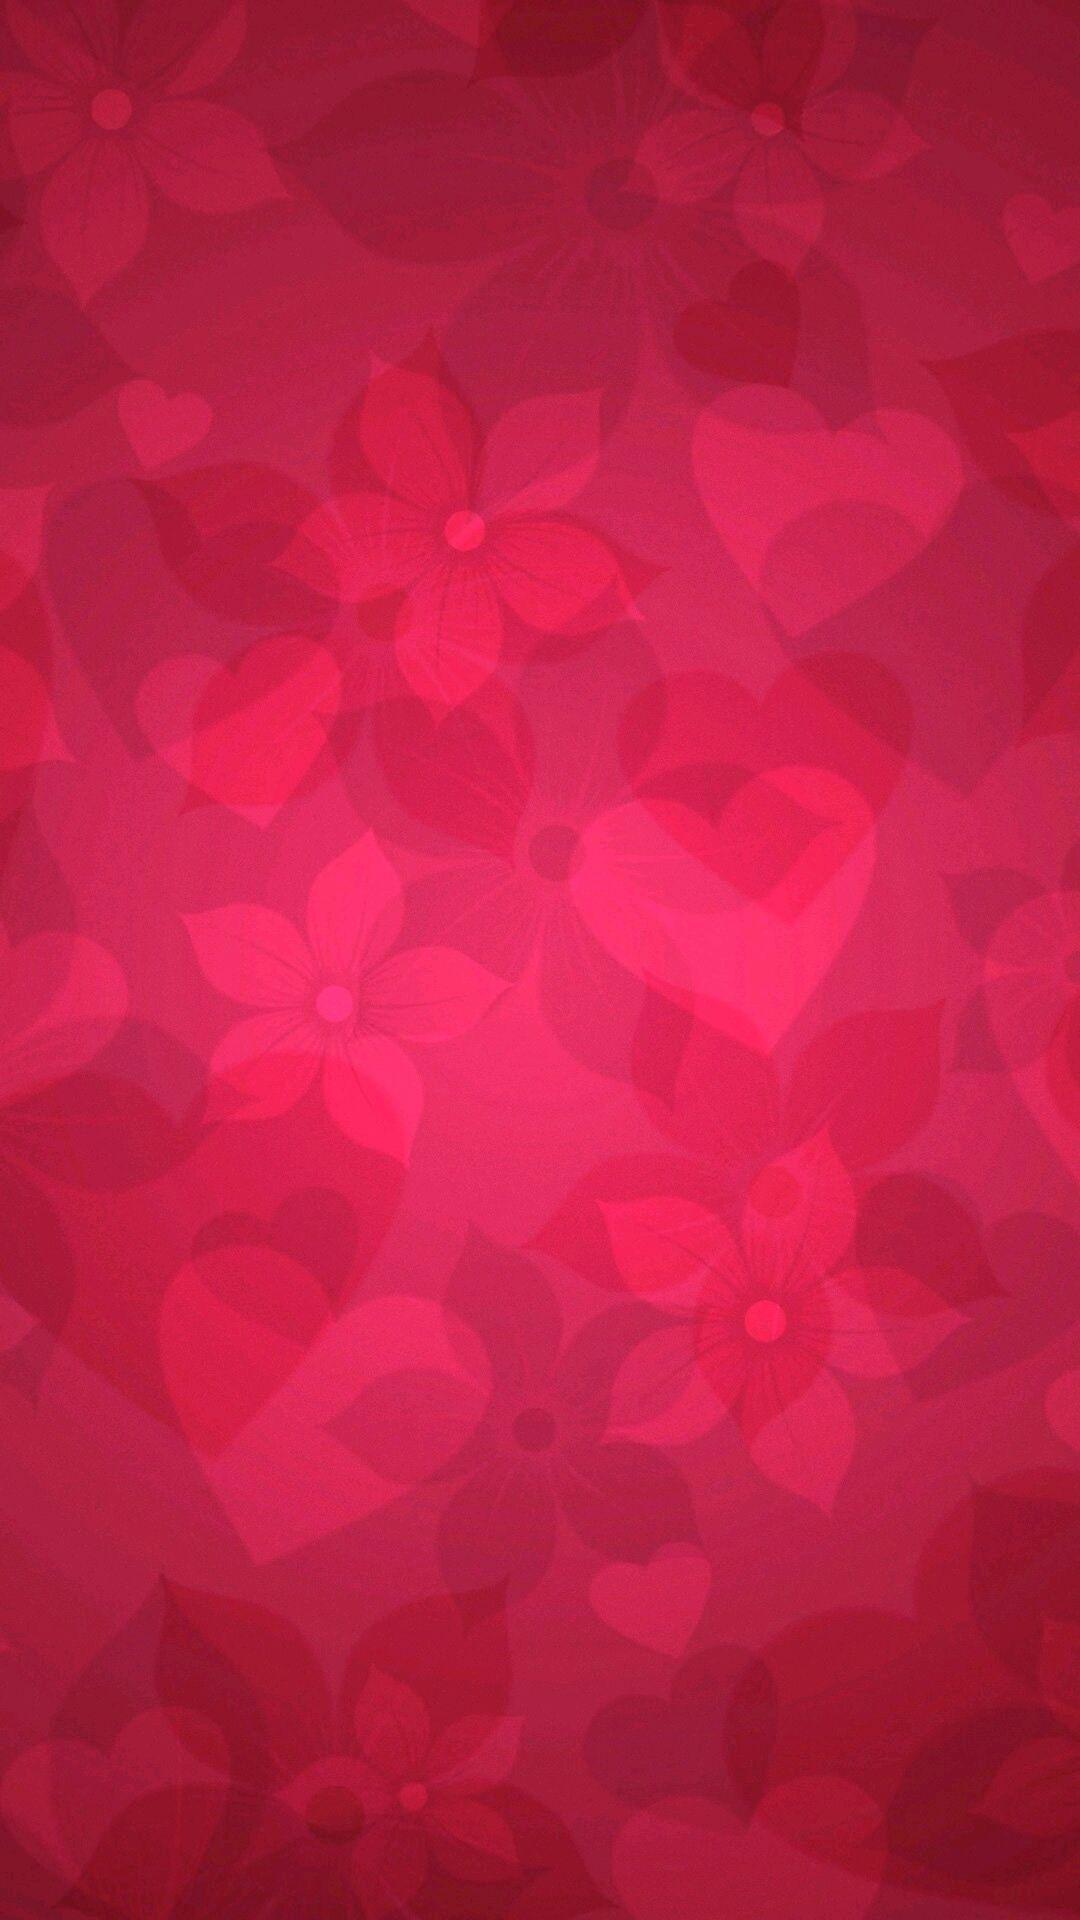 Love Cute Background Wallpaper Fundo De Tela Feminino Papel De Parede Flores Papel De Parede Para Iphone